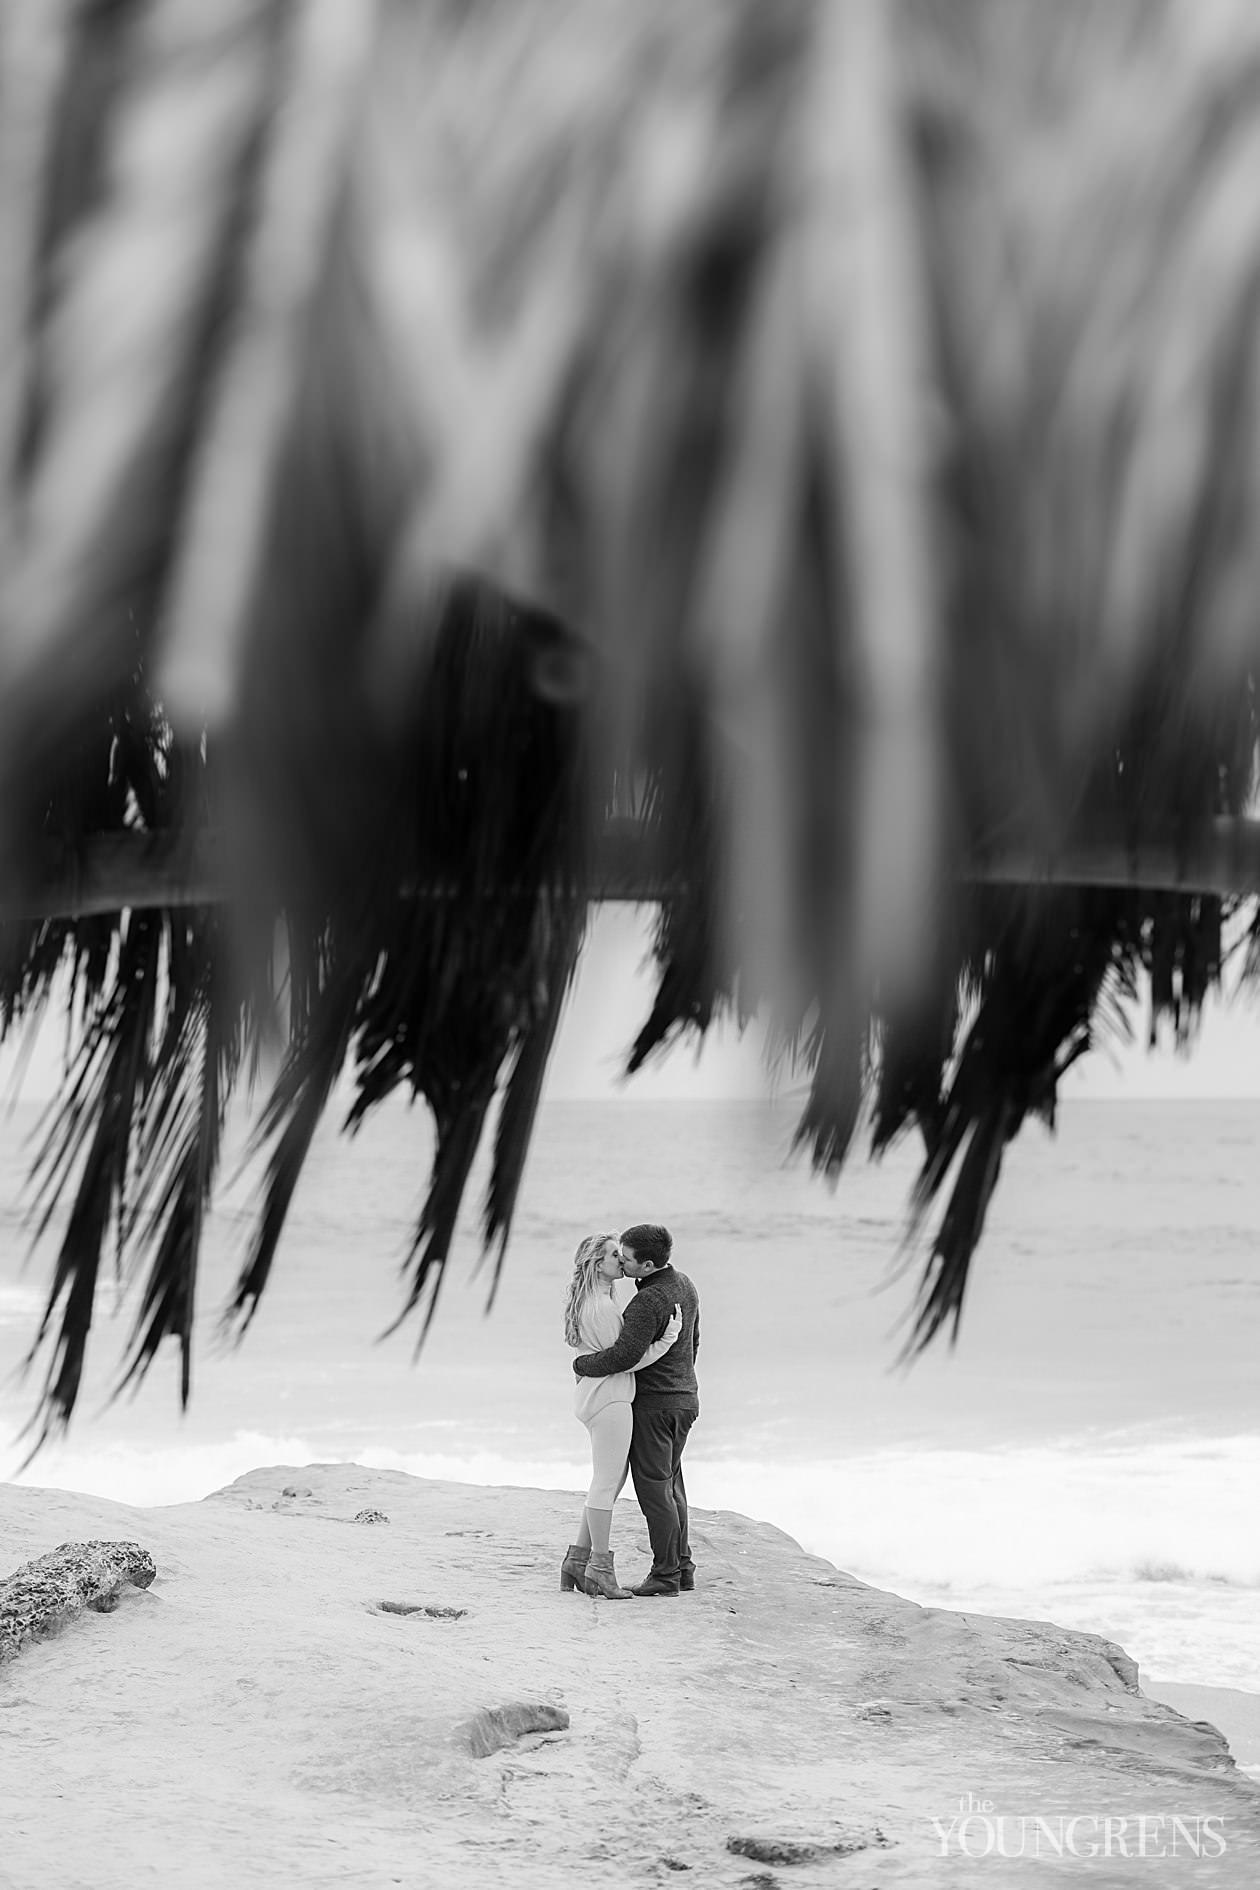 windansea engagement session, engagement session at windansea, la jolla engagement session, san diego beach engagement session, la jolla beach engagement session, windansea beach engagement session